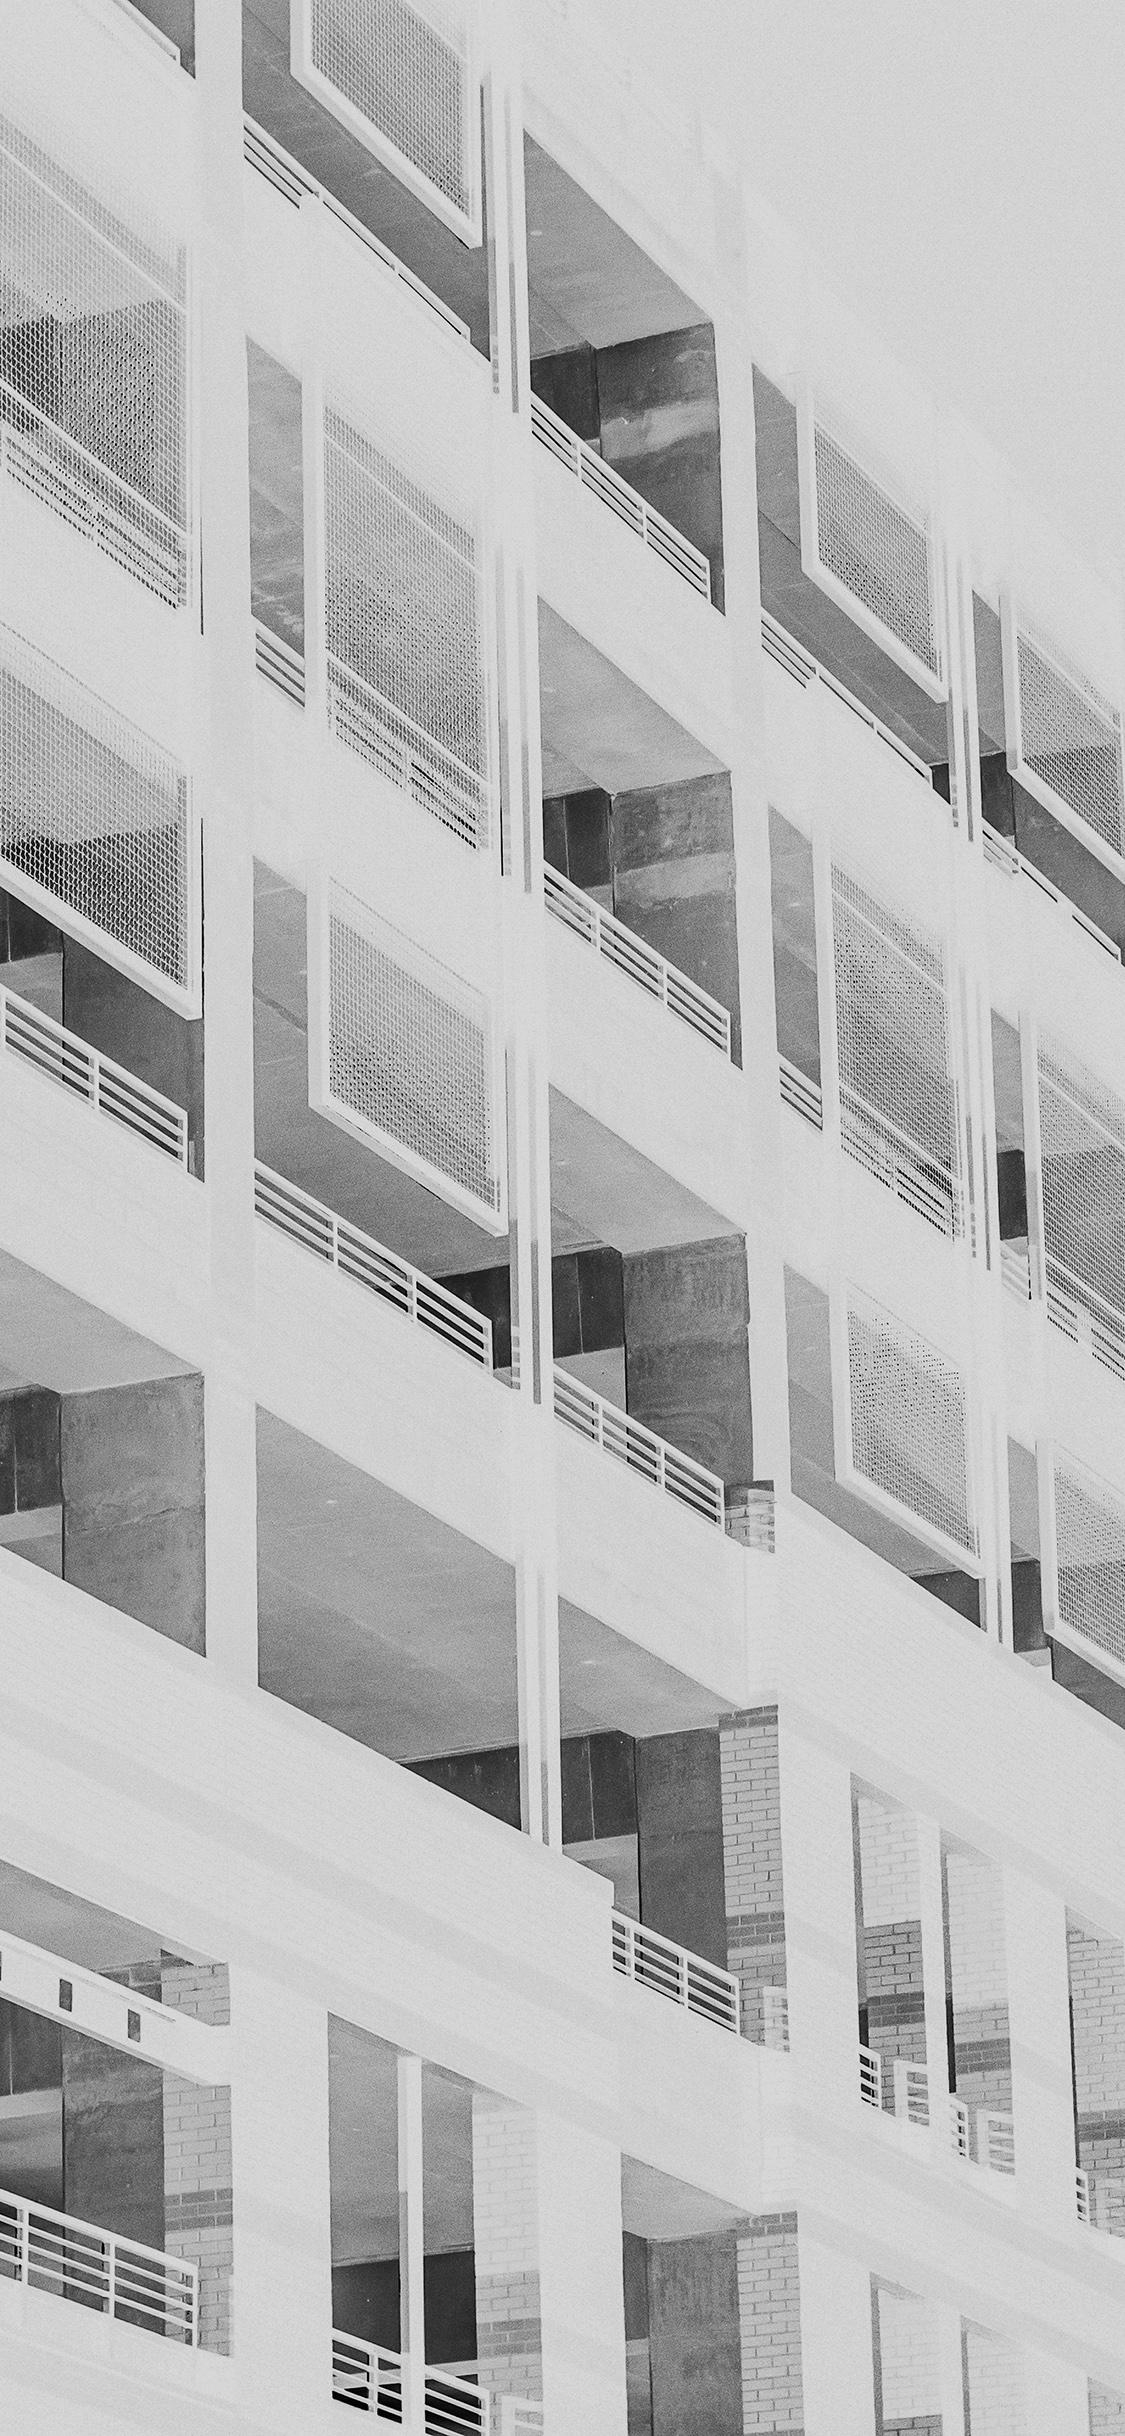 iPhoneXpapers.com-Apple-iPhone-wallpaper-mu18-bw-night-building-window-white-architecture-city